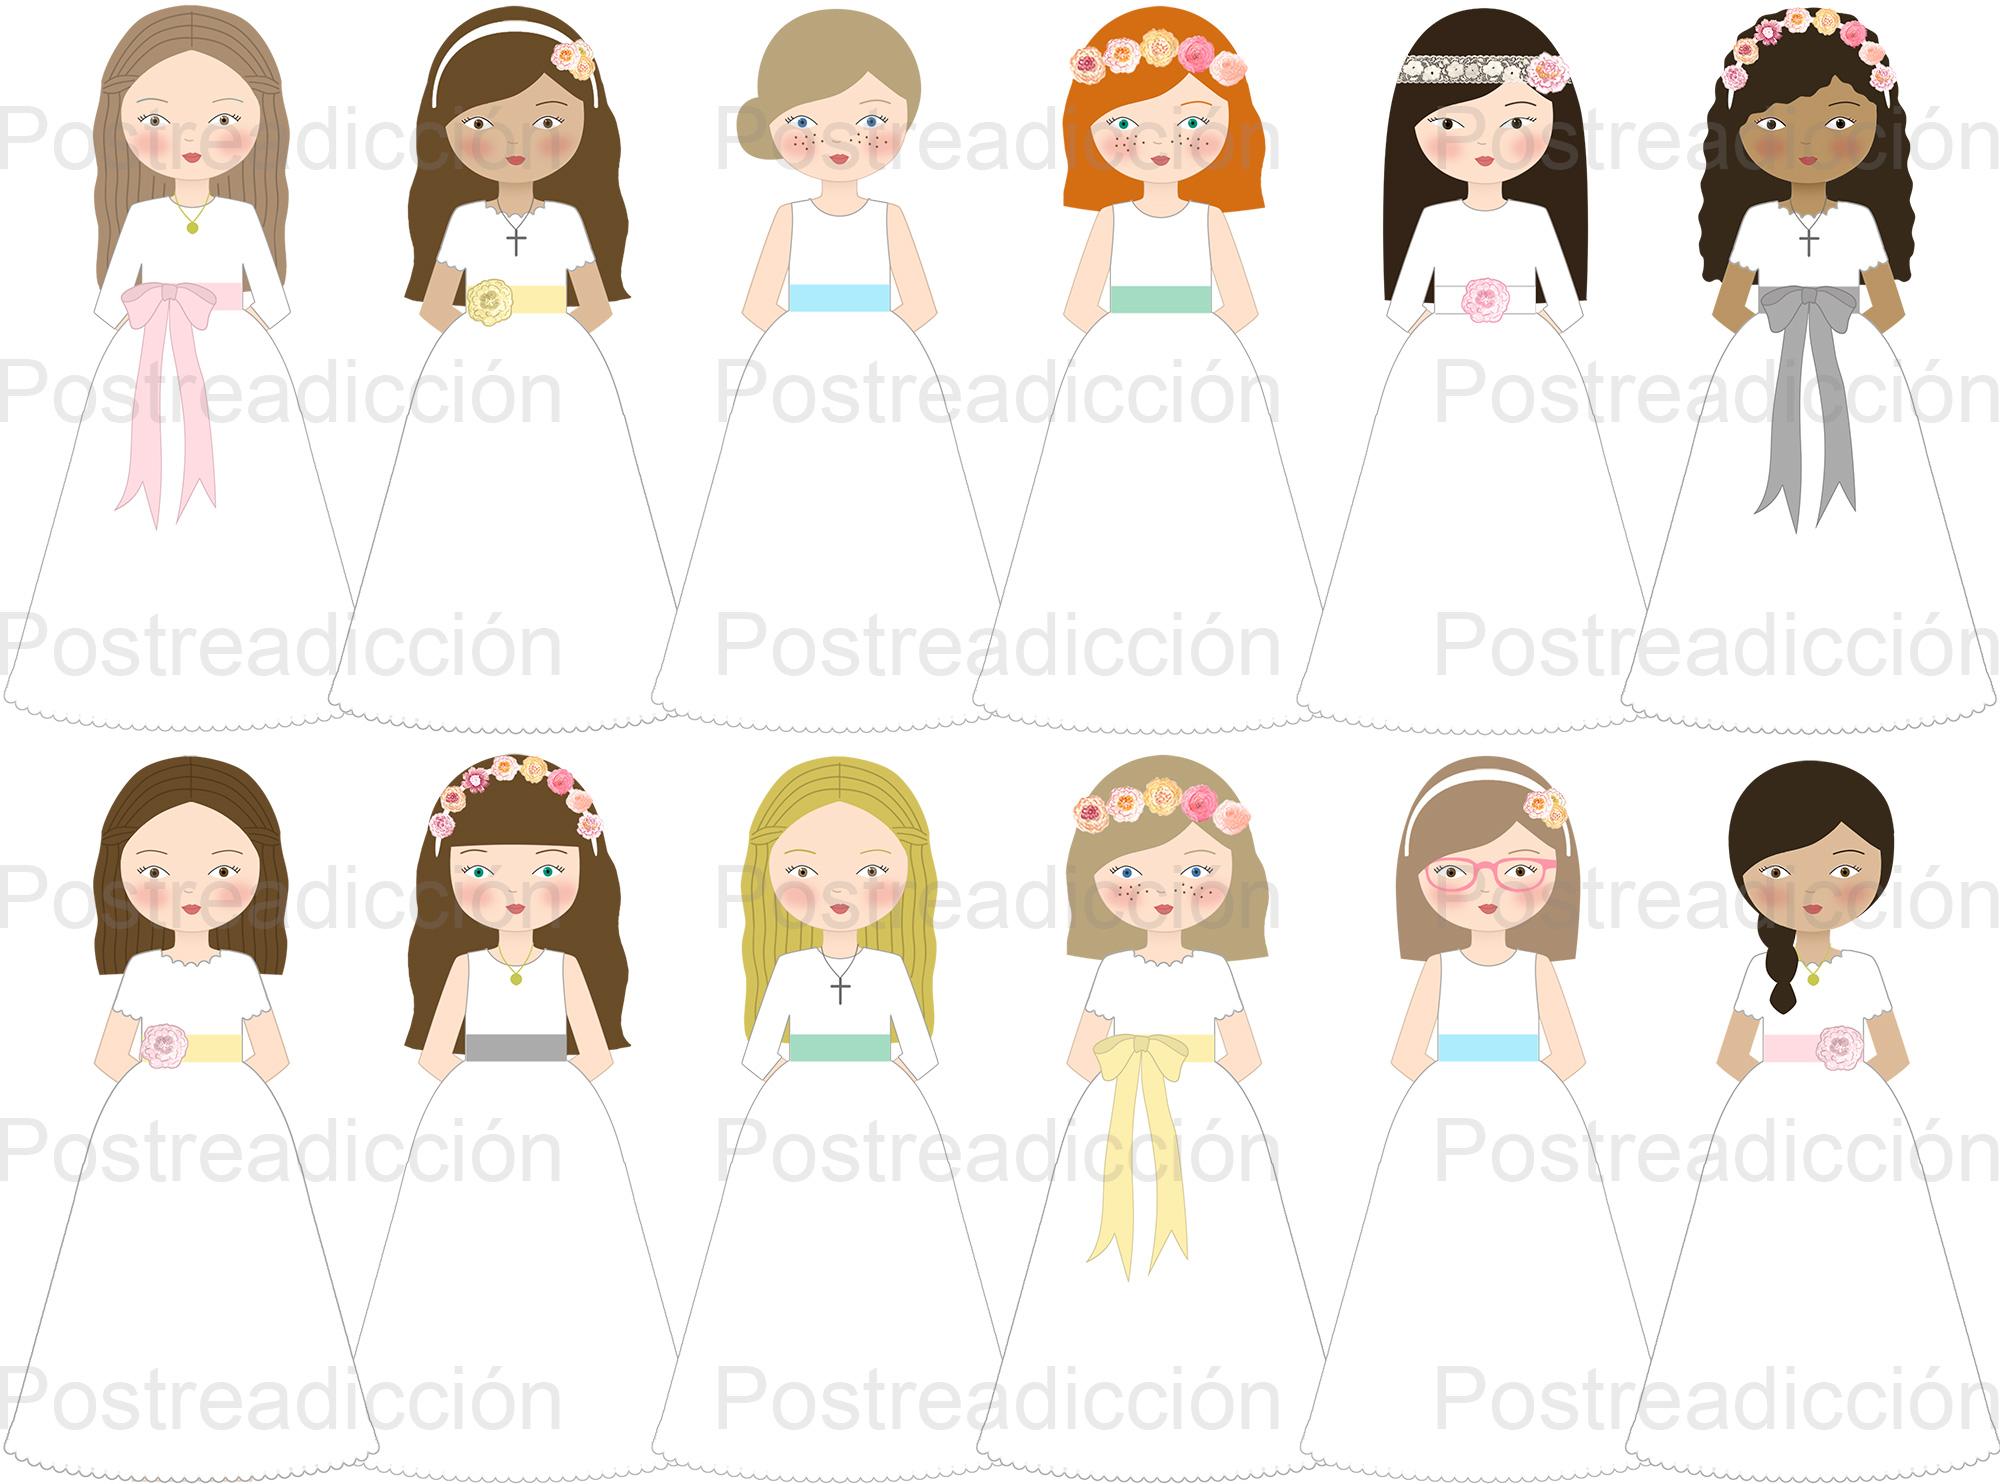 Imagen de producto: https://tienda.postreadiccion.com/img/articulos/secundarias14017-kit-imprimible-de-comunion-carlota-liberty-betsy-ann-c-1.jpg